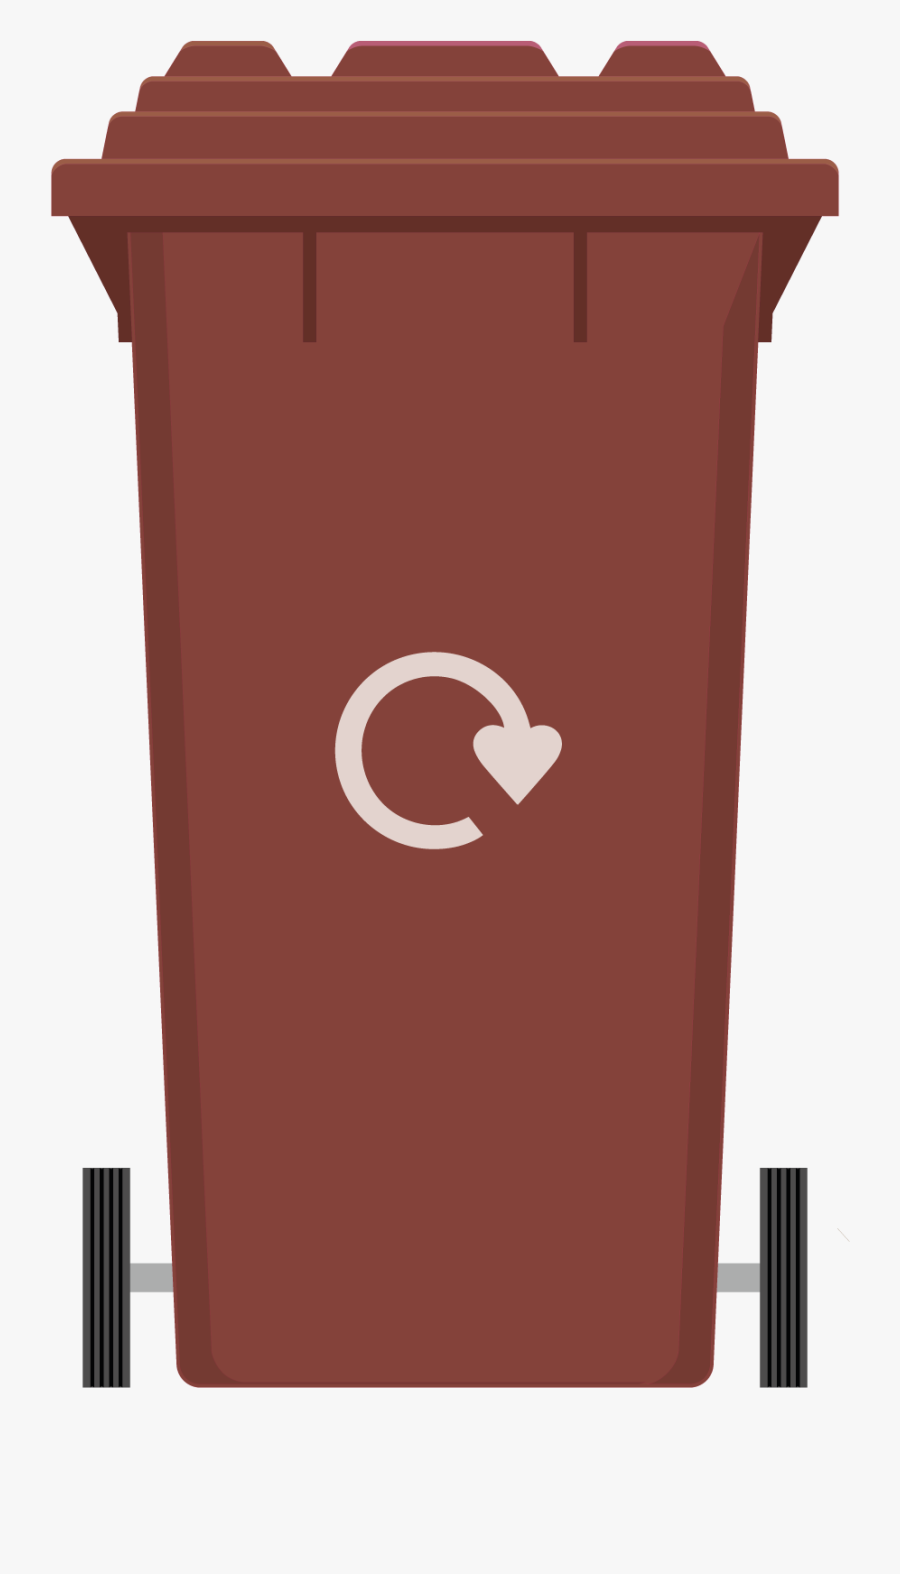 Bin Clipart Red - Compost Bin Brown Egg, Transparent Clipart